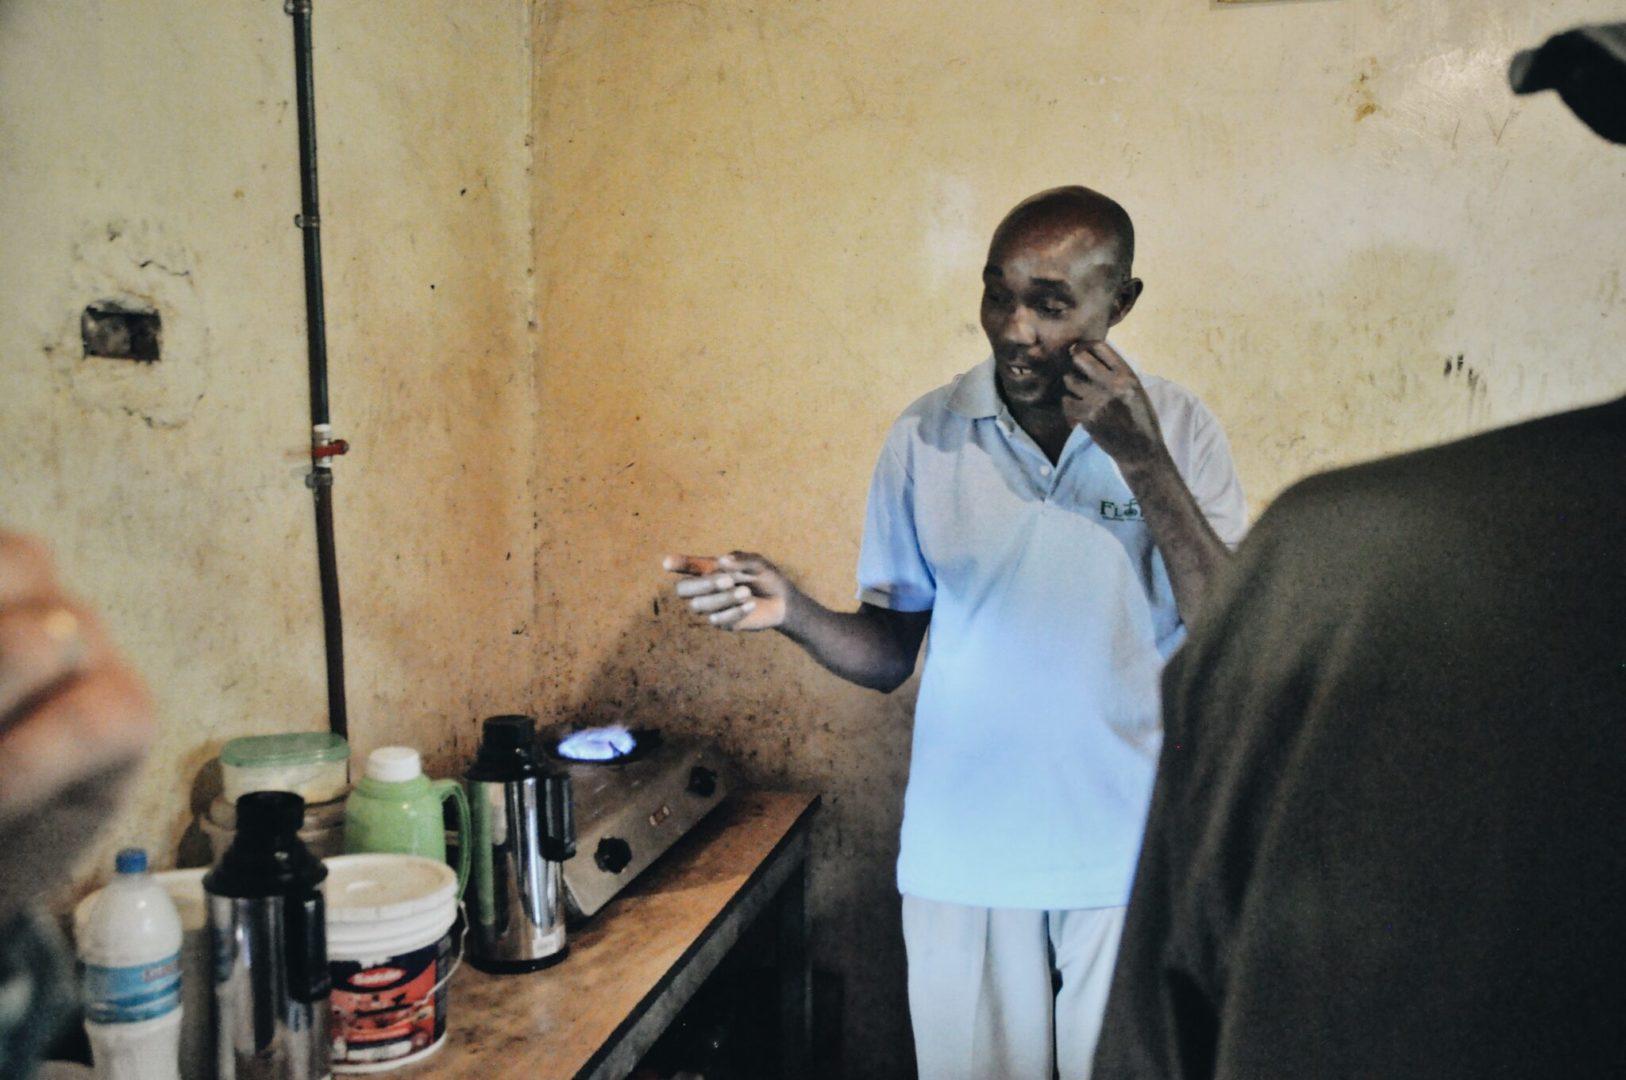 Wilson's cow fuels his kitchen